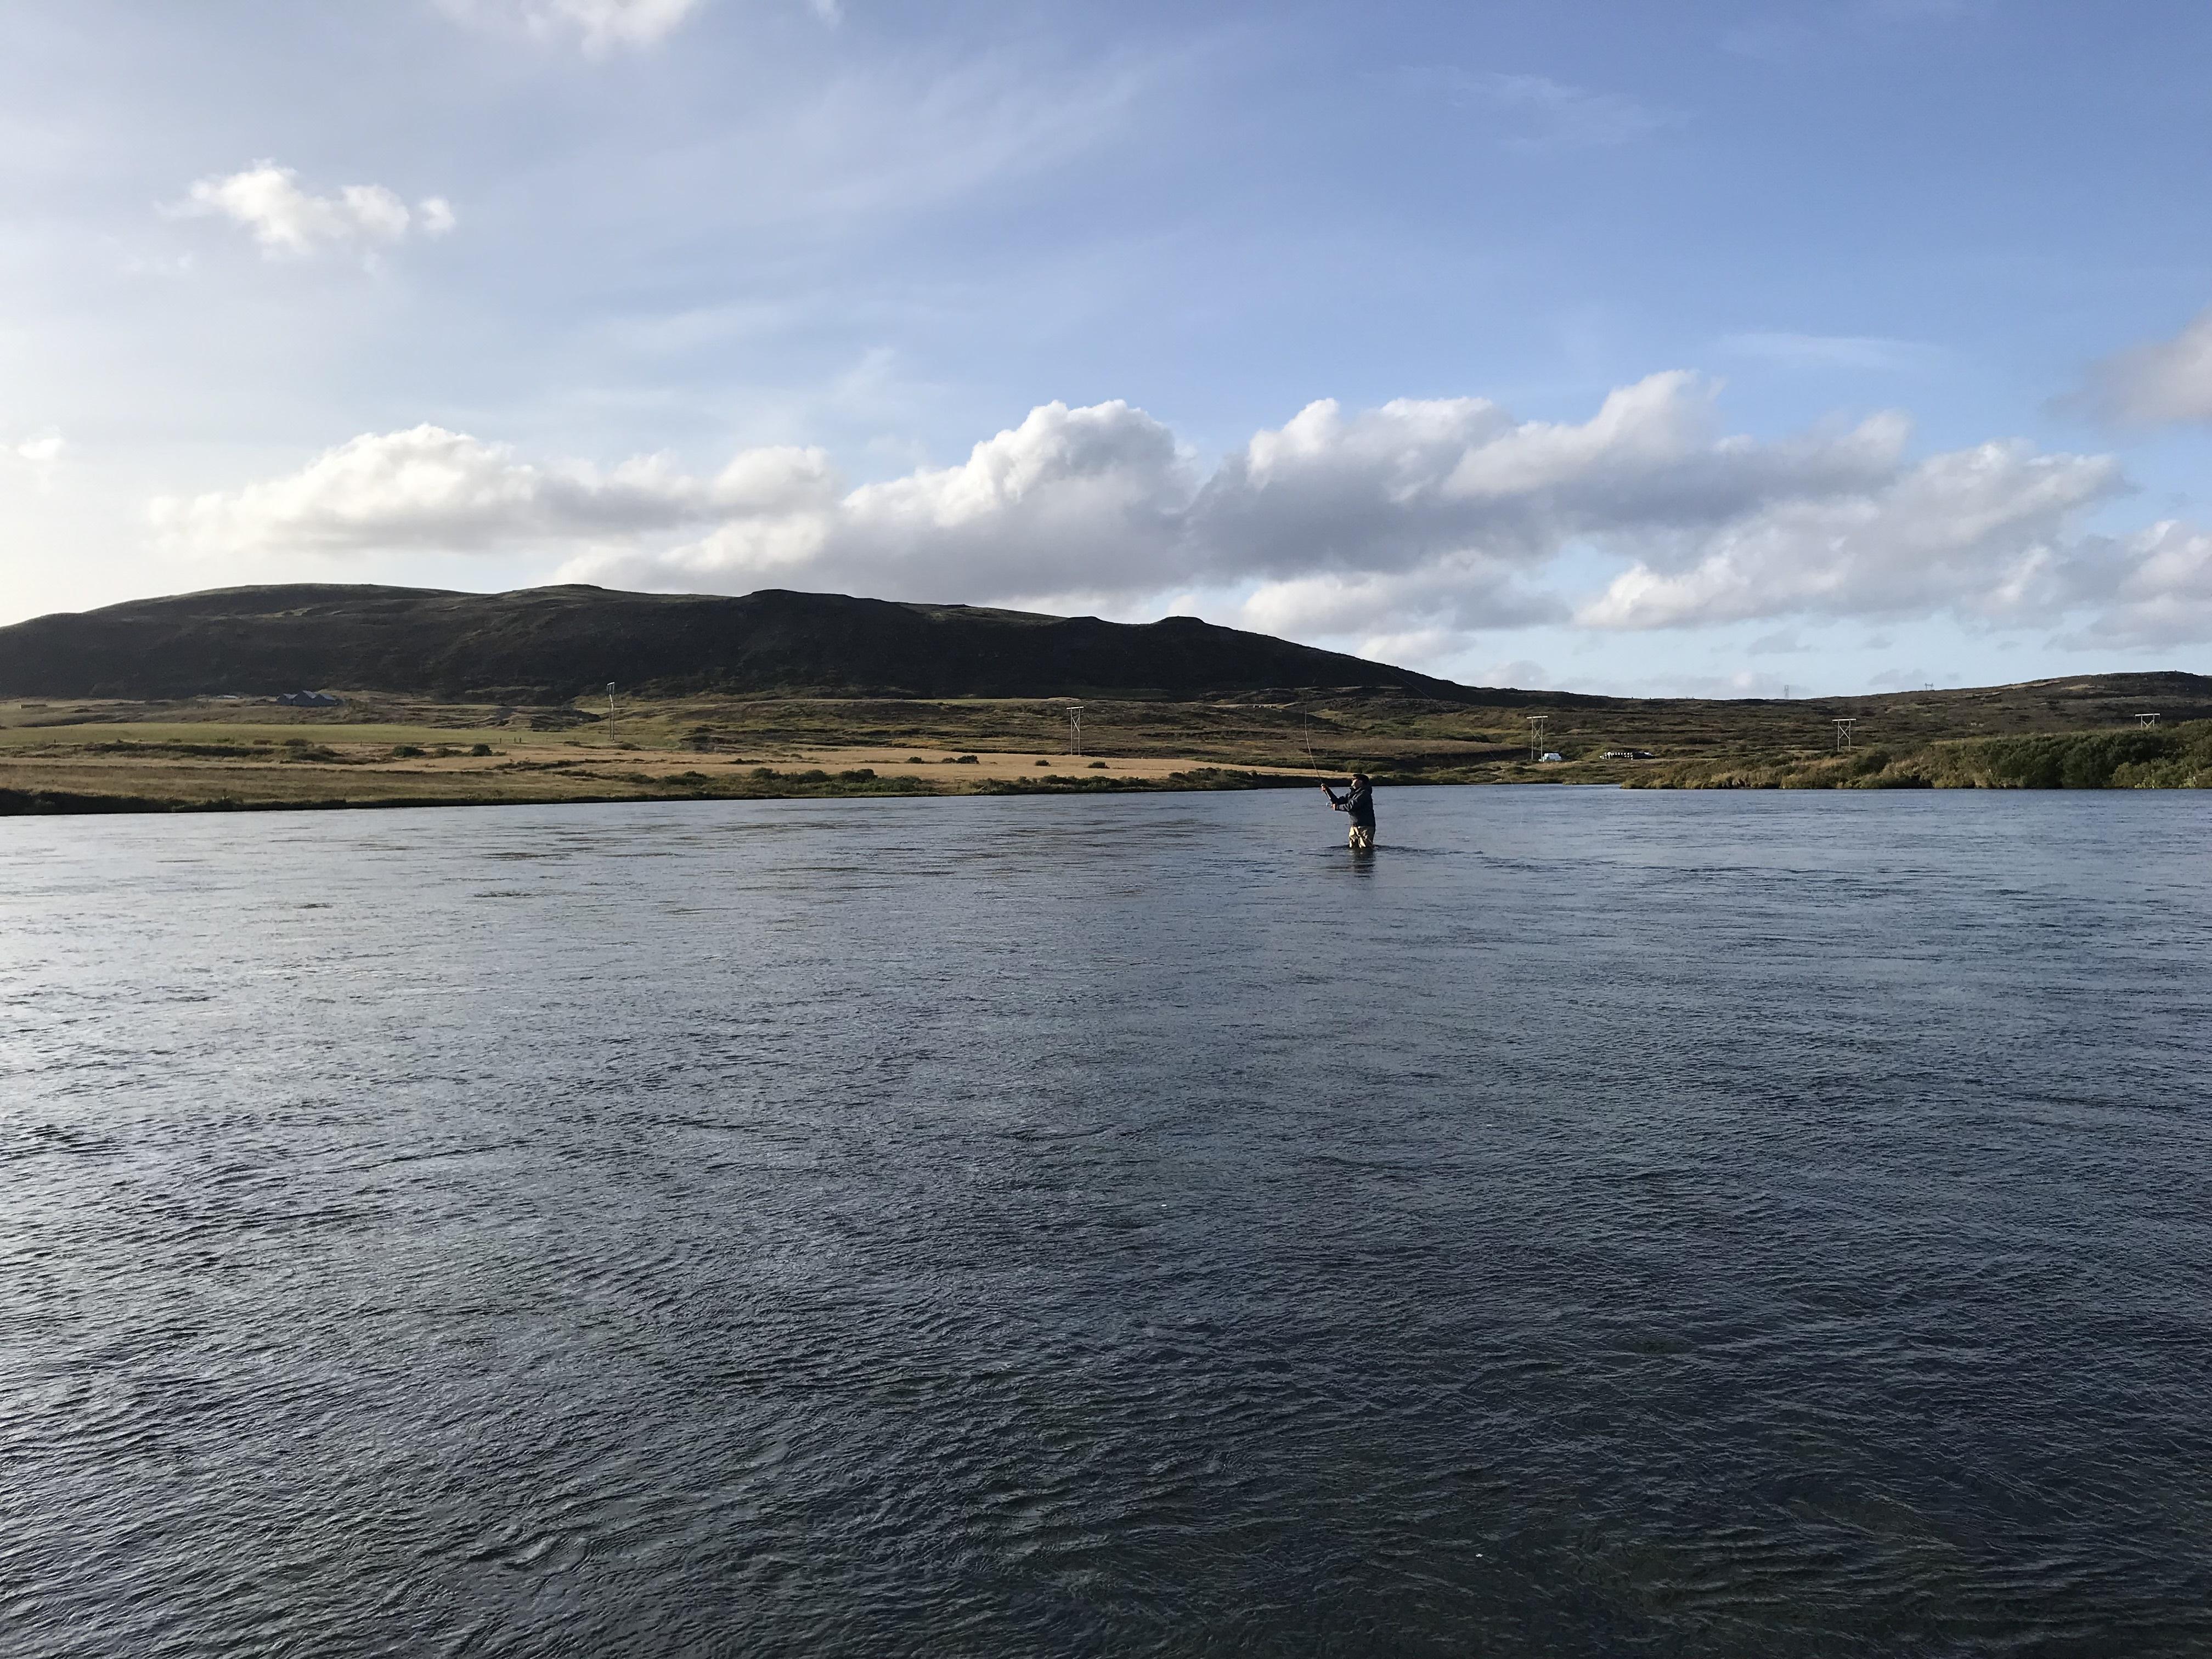 sog sogid iceland island islanti salmon laks lax lohi perhokalastus flyfishing flugfiske fluefiske perhokalastusmatka salmonflyfishing kalastus kalastusmatka fishmaster globalfishing